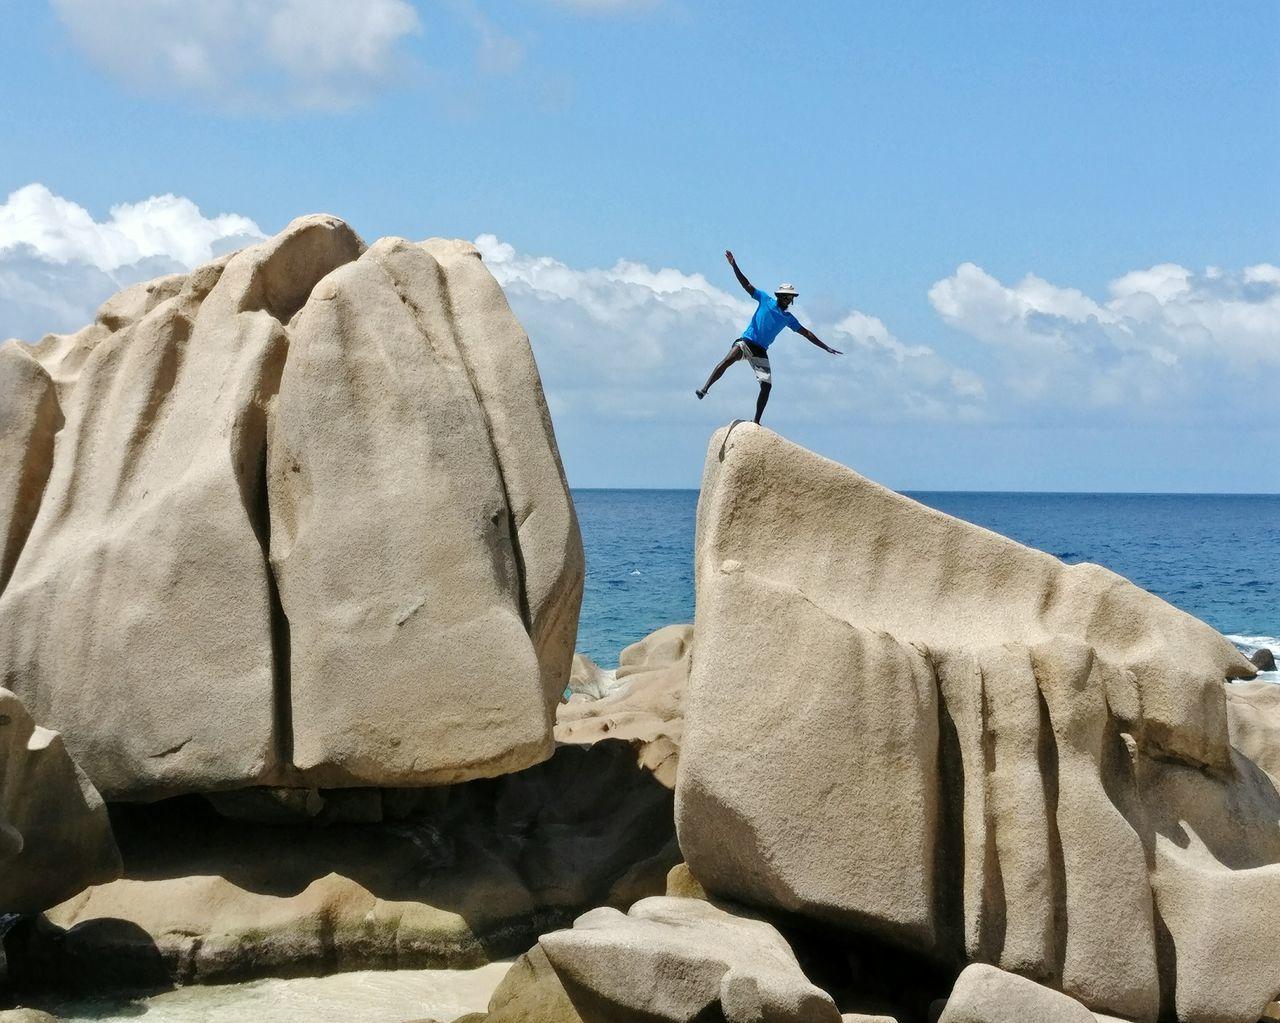 Seychellesisland Seychelles La Digue Scenics Nature Rock Formation Rock - Object Sea Outdoors Carefree Escapism People Of The Oceans People And Places Having Fun Outdoor Activity Outdoor Activities Horizon Over Water Men Ocean Nature